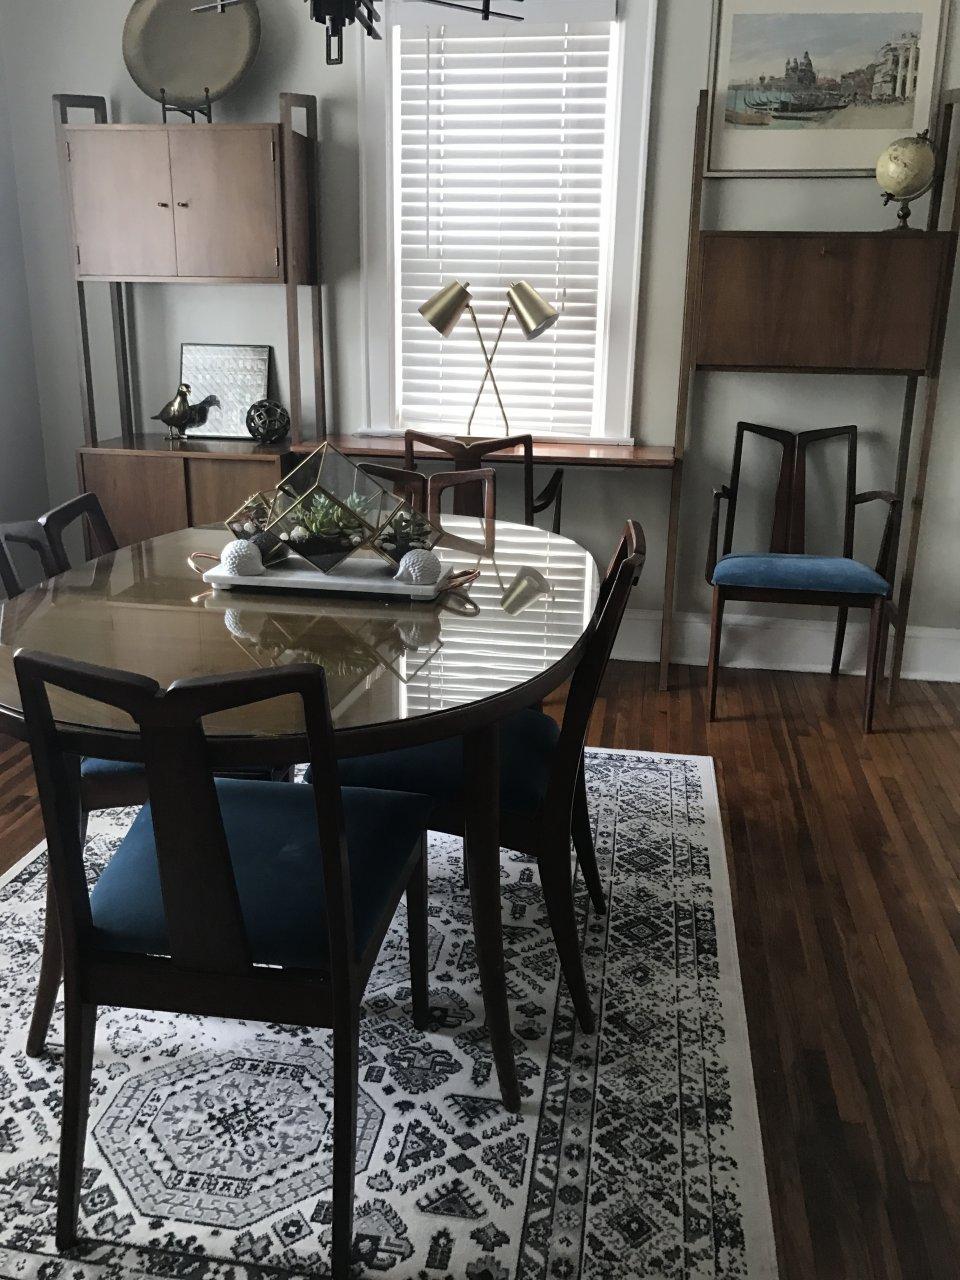 Drexel dining room furniture